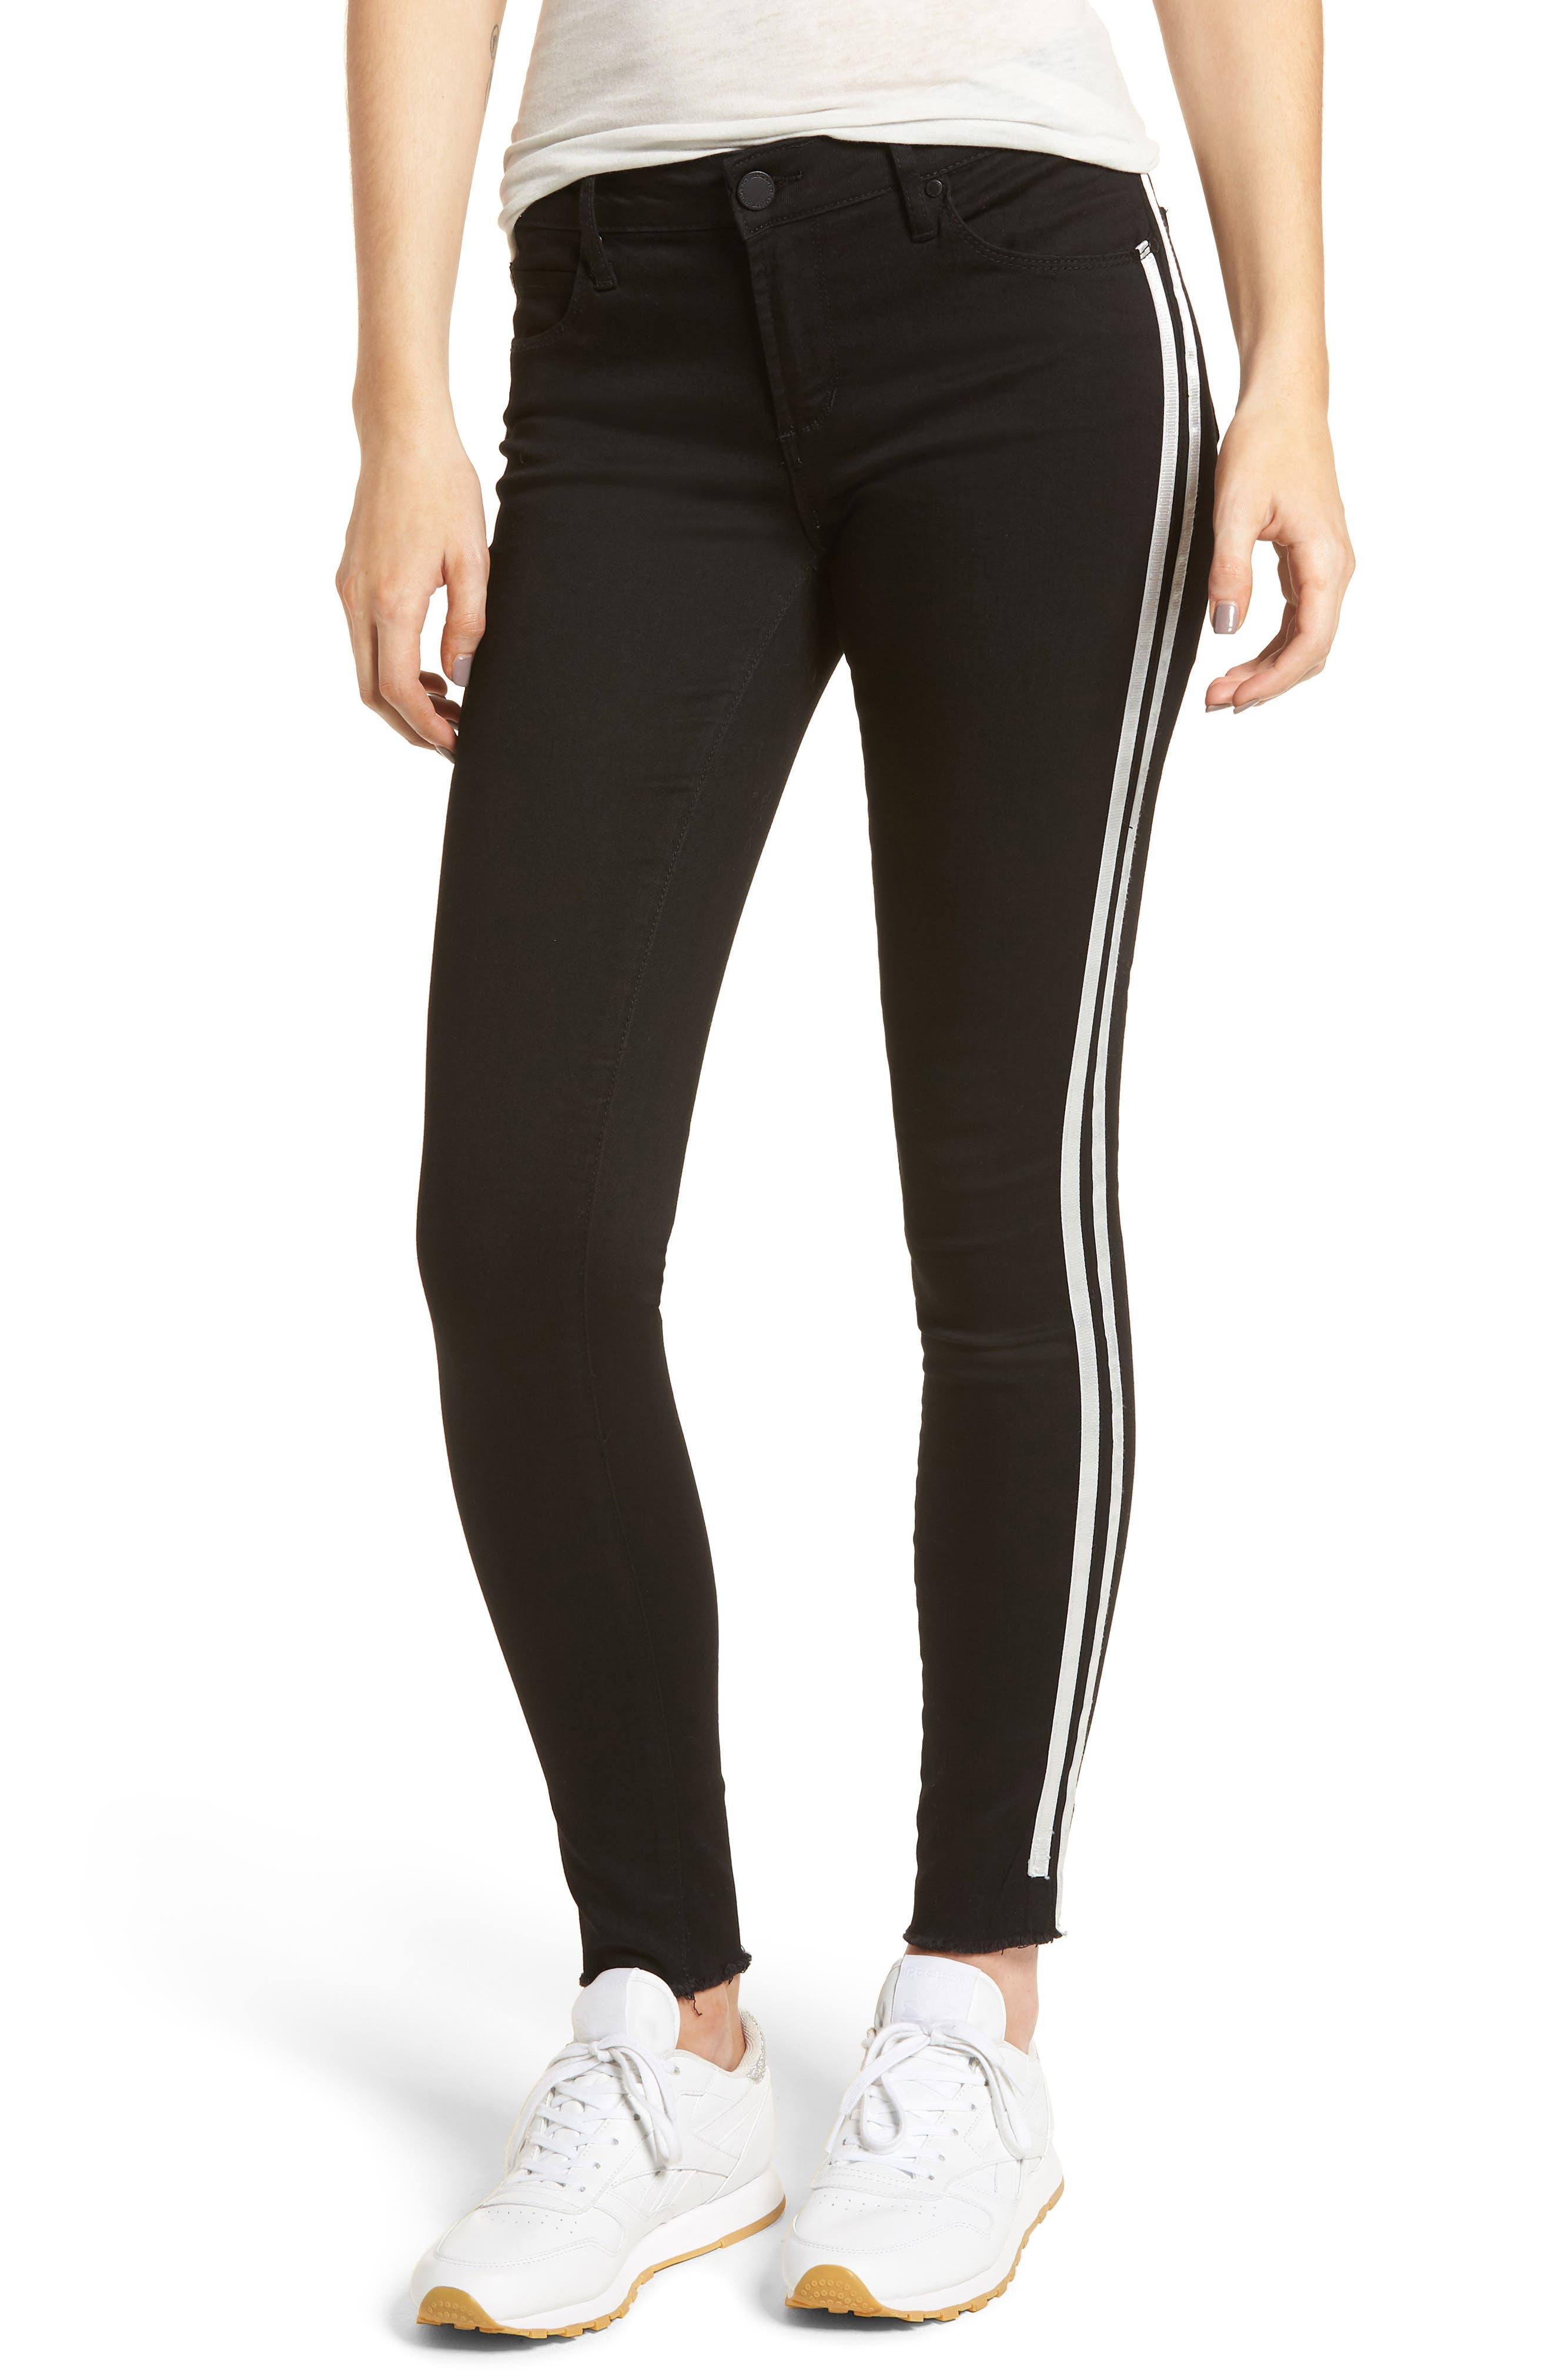 Articles of Society Sarah Stripe Skinny Jeans